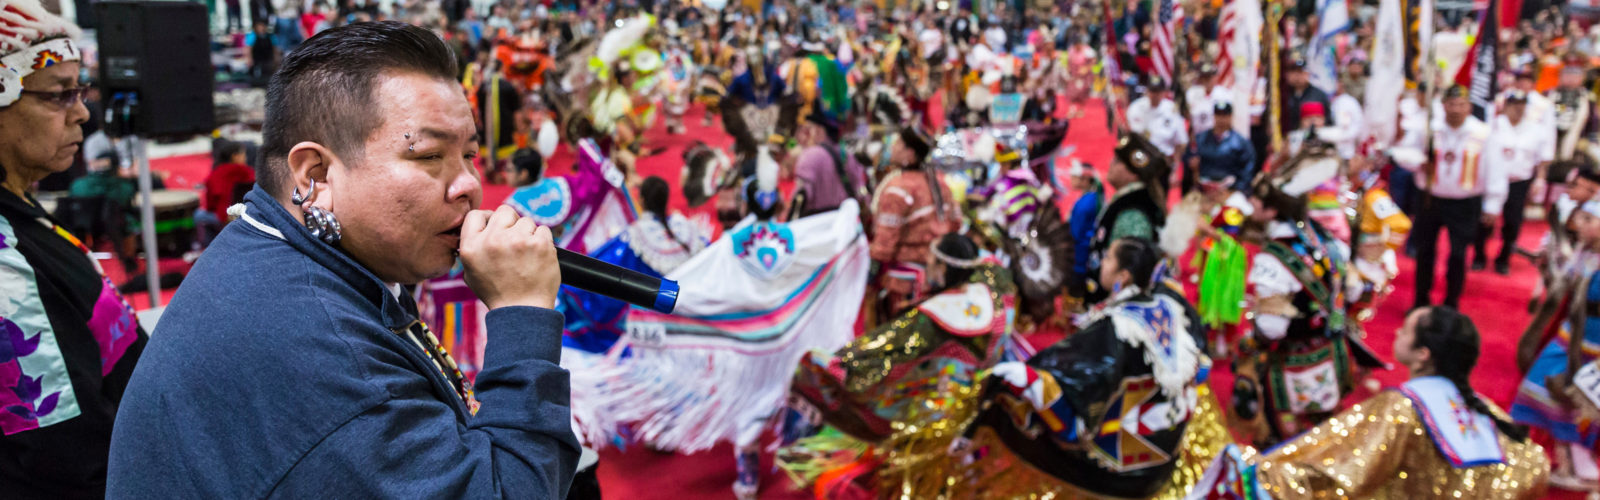 Scenes of dancers from Powwow 2017